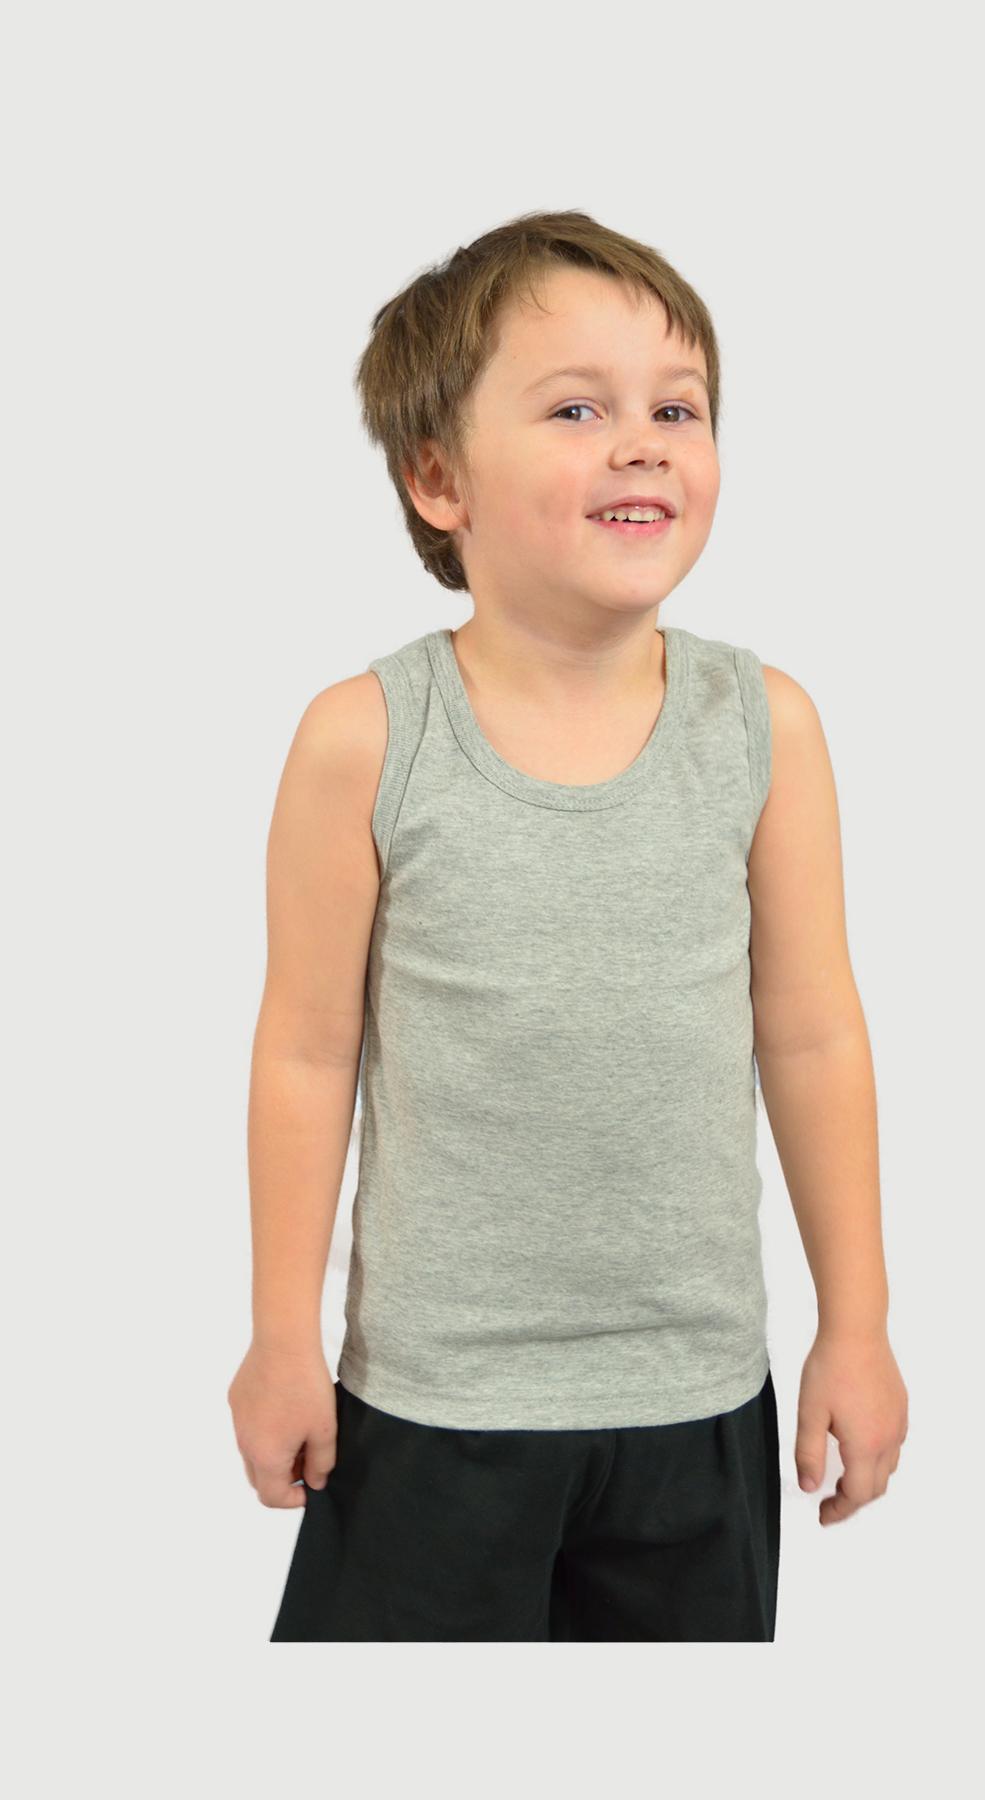 Monag 402070 - Baby Rib Tank Top